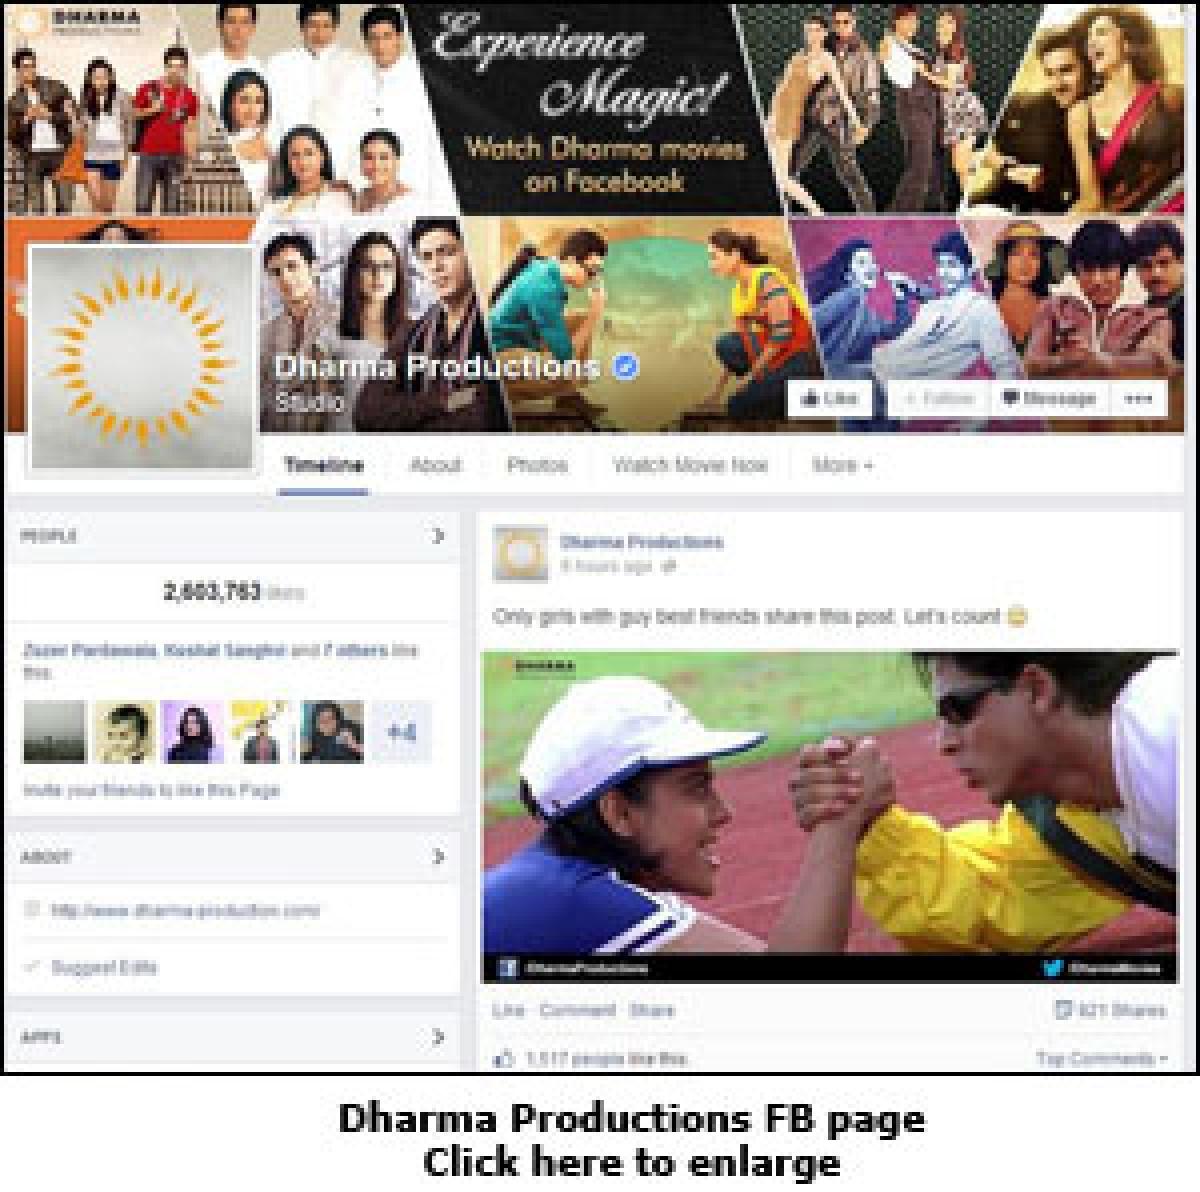 Dharma movies on Facebook